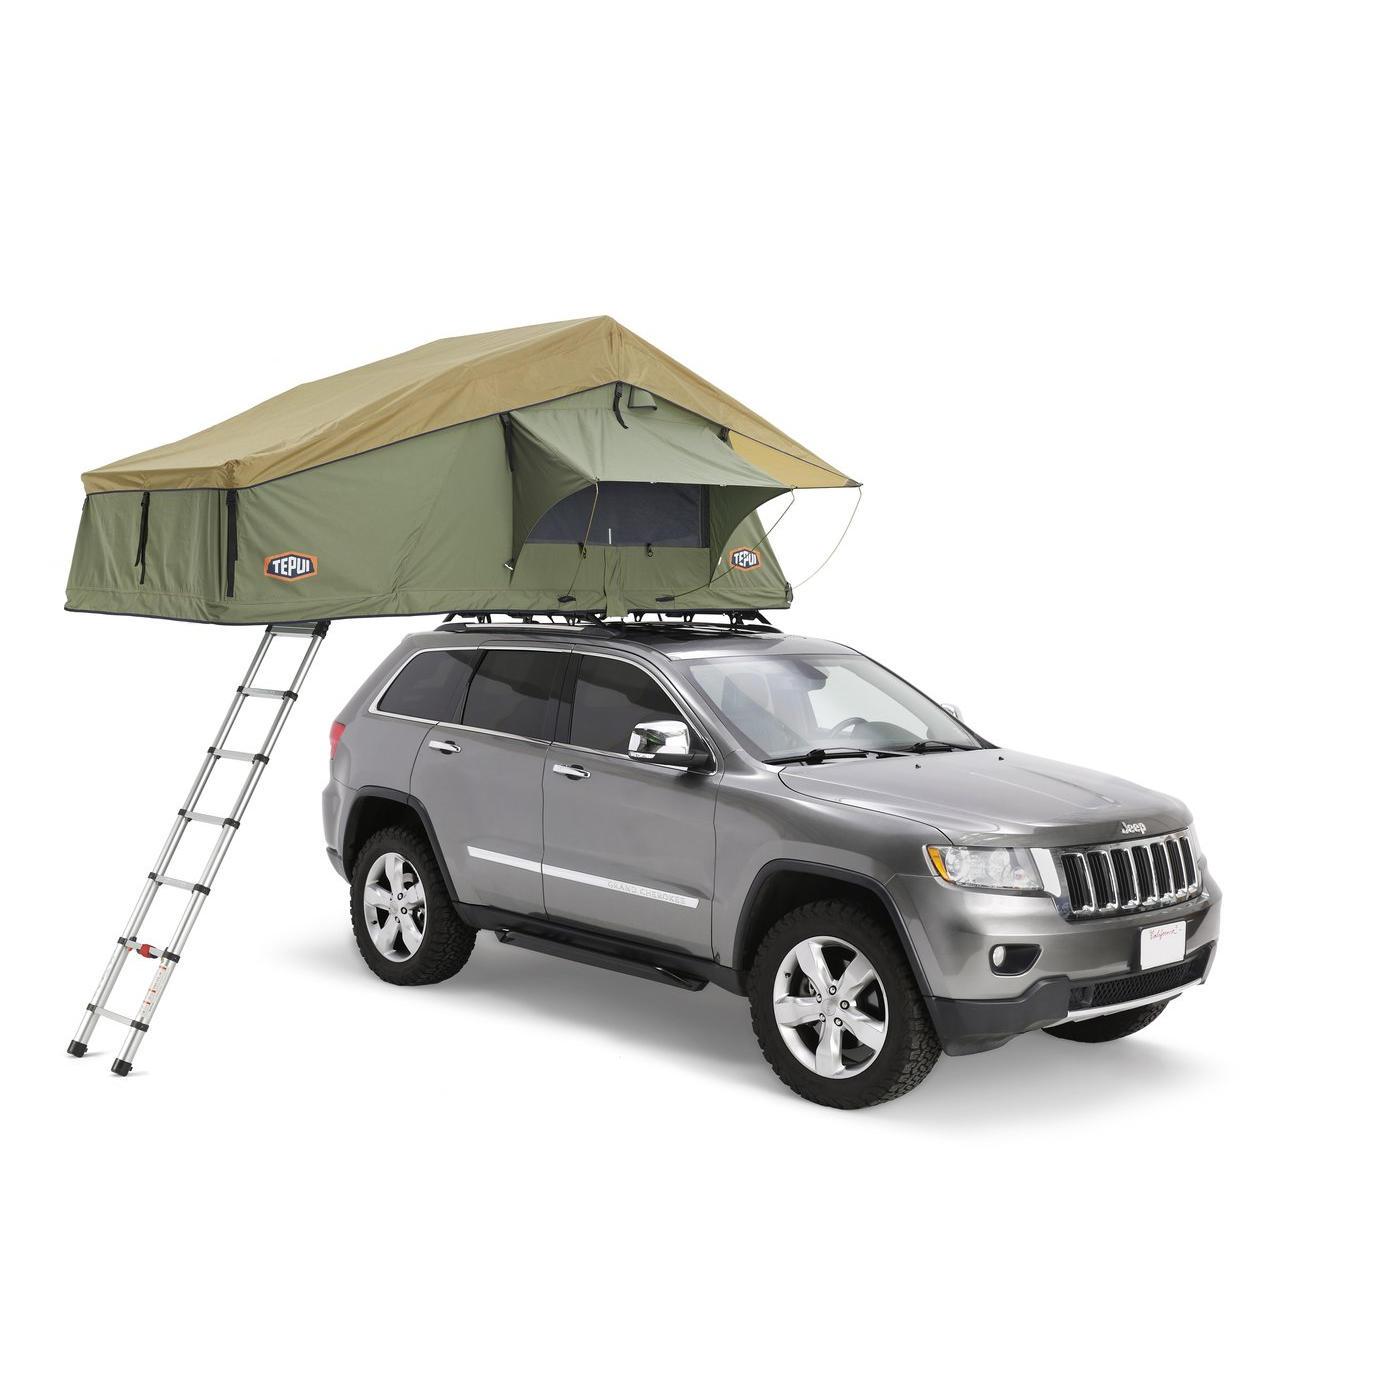 Thule Tepui Explorer Autana 3 Tent w/ Annex - Olive Green